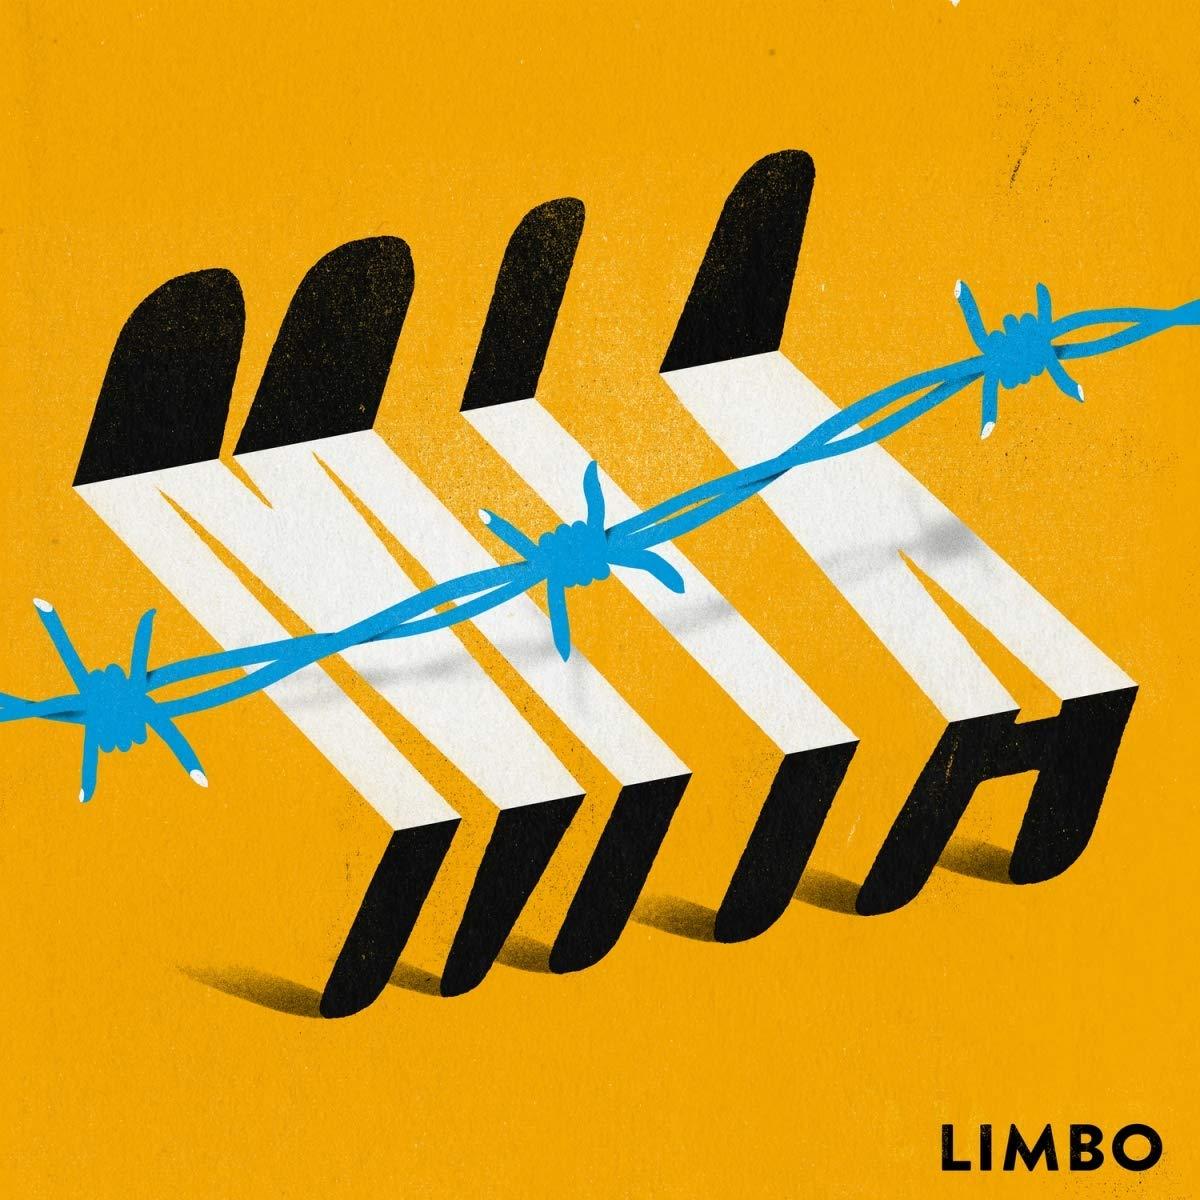 Mia. - Limbo (Album Cover)